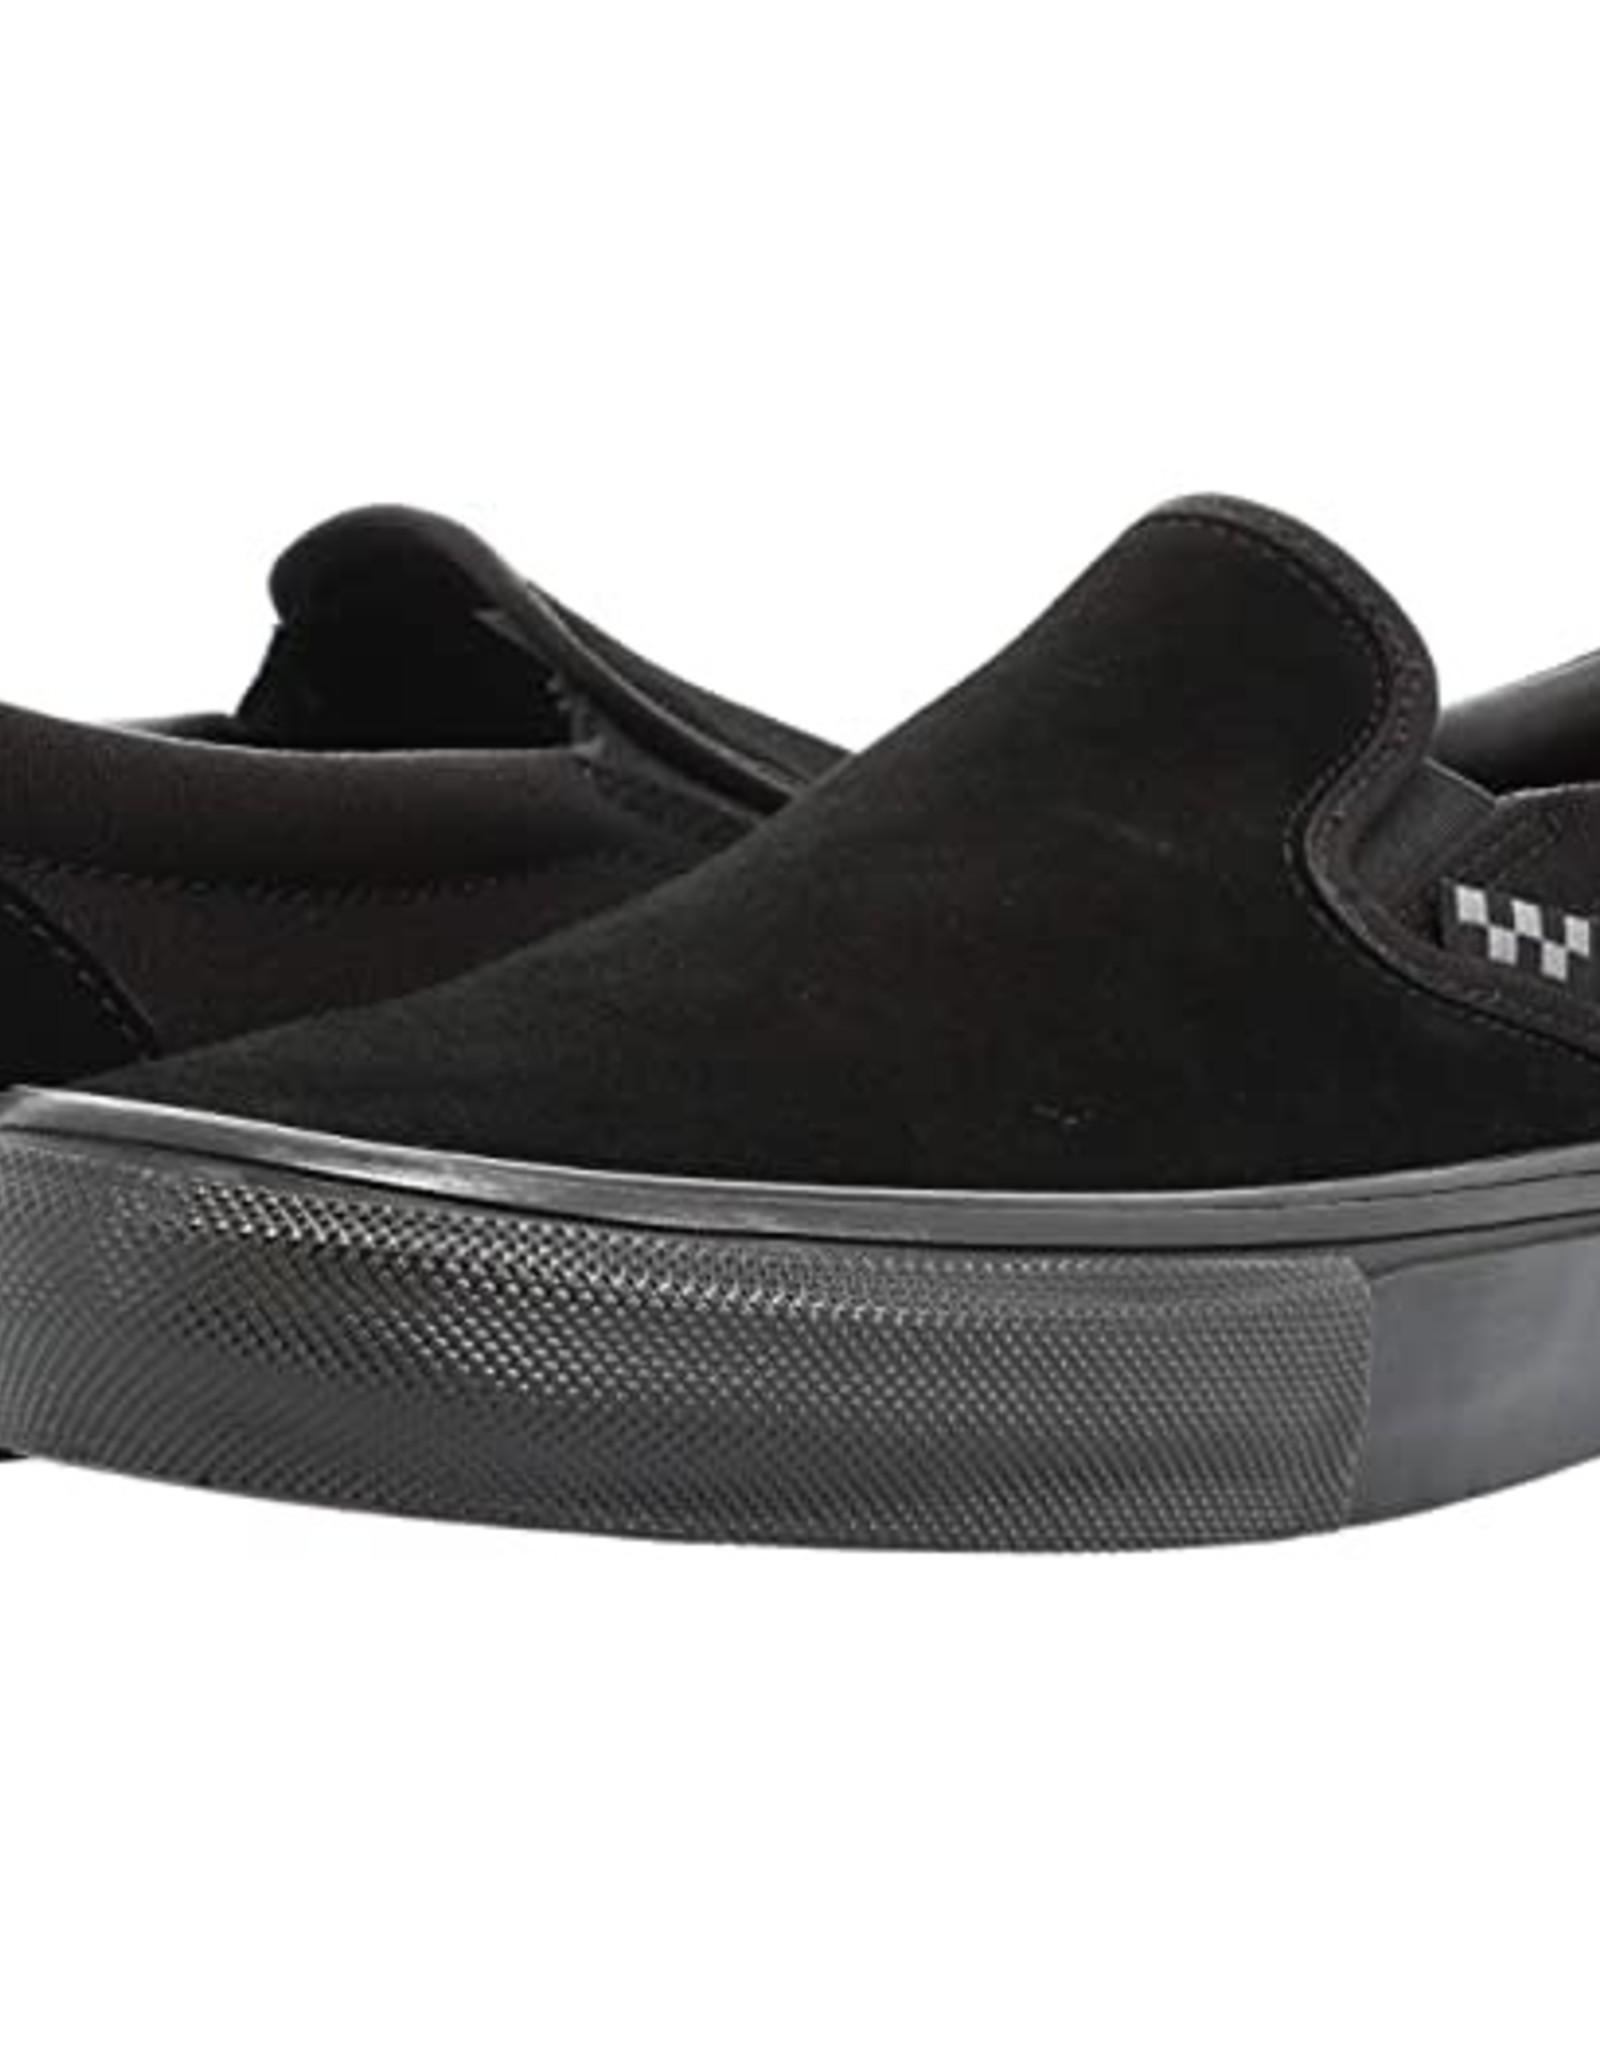 VANS VANS SKATE SLIP-ON BLACK BLACK